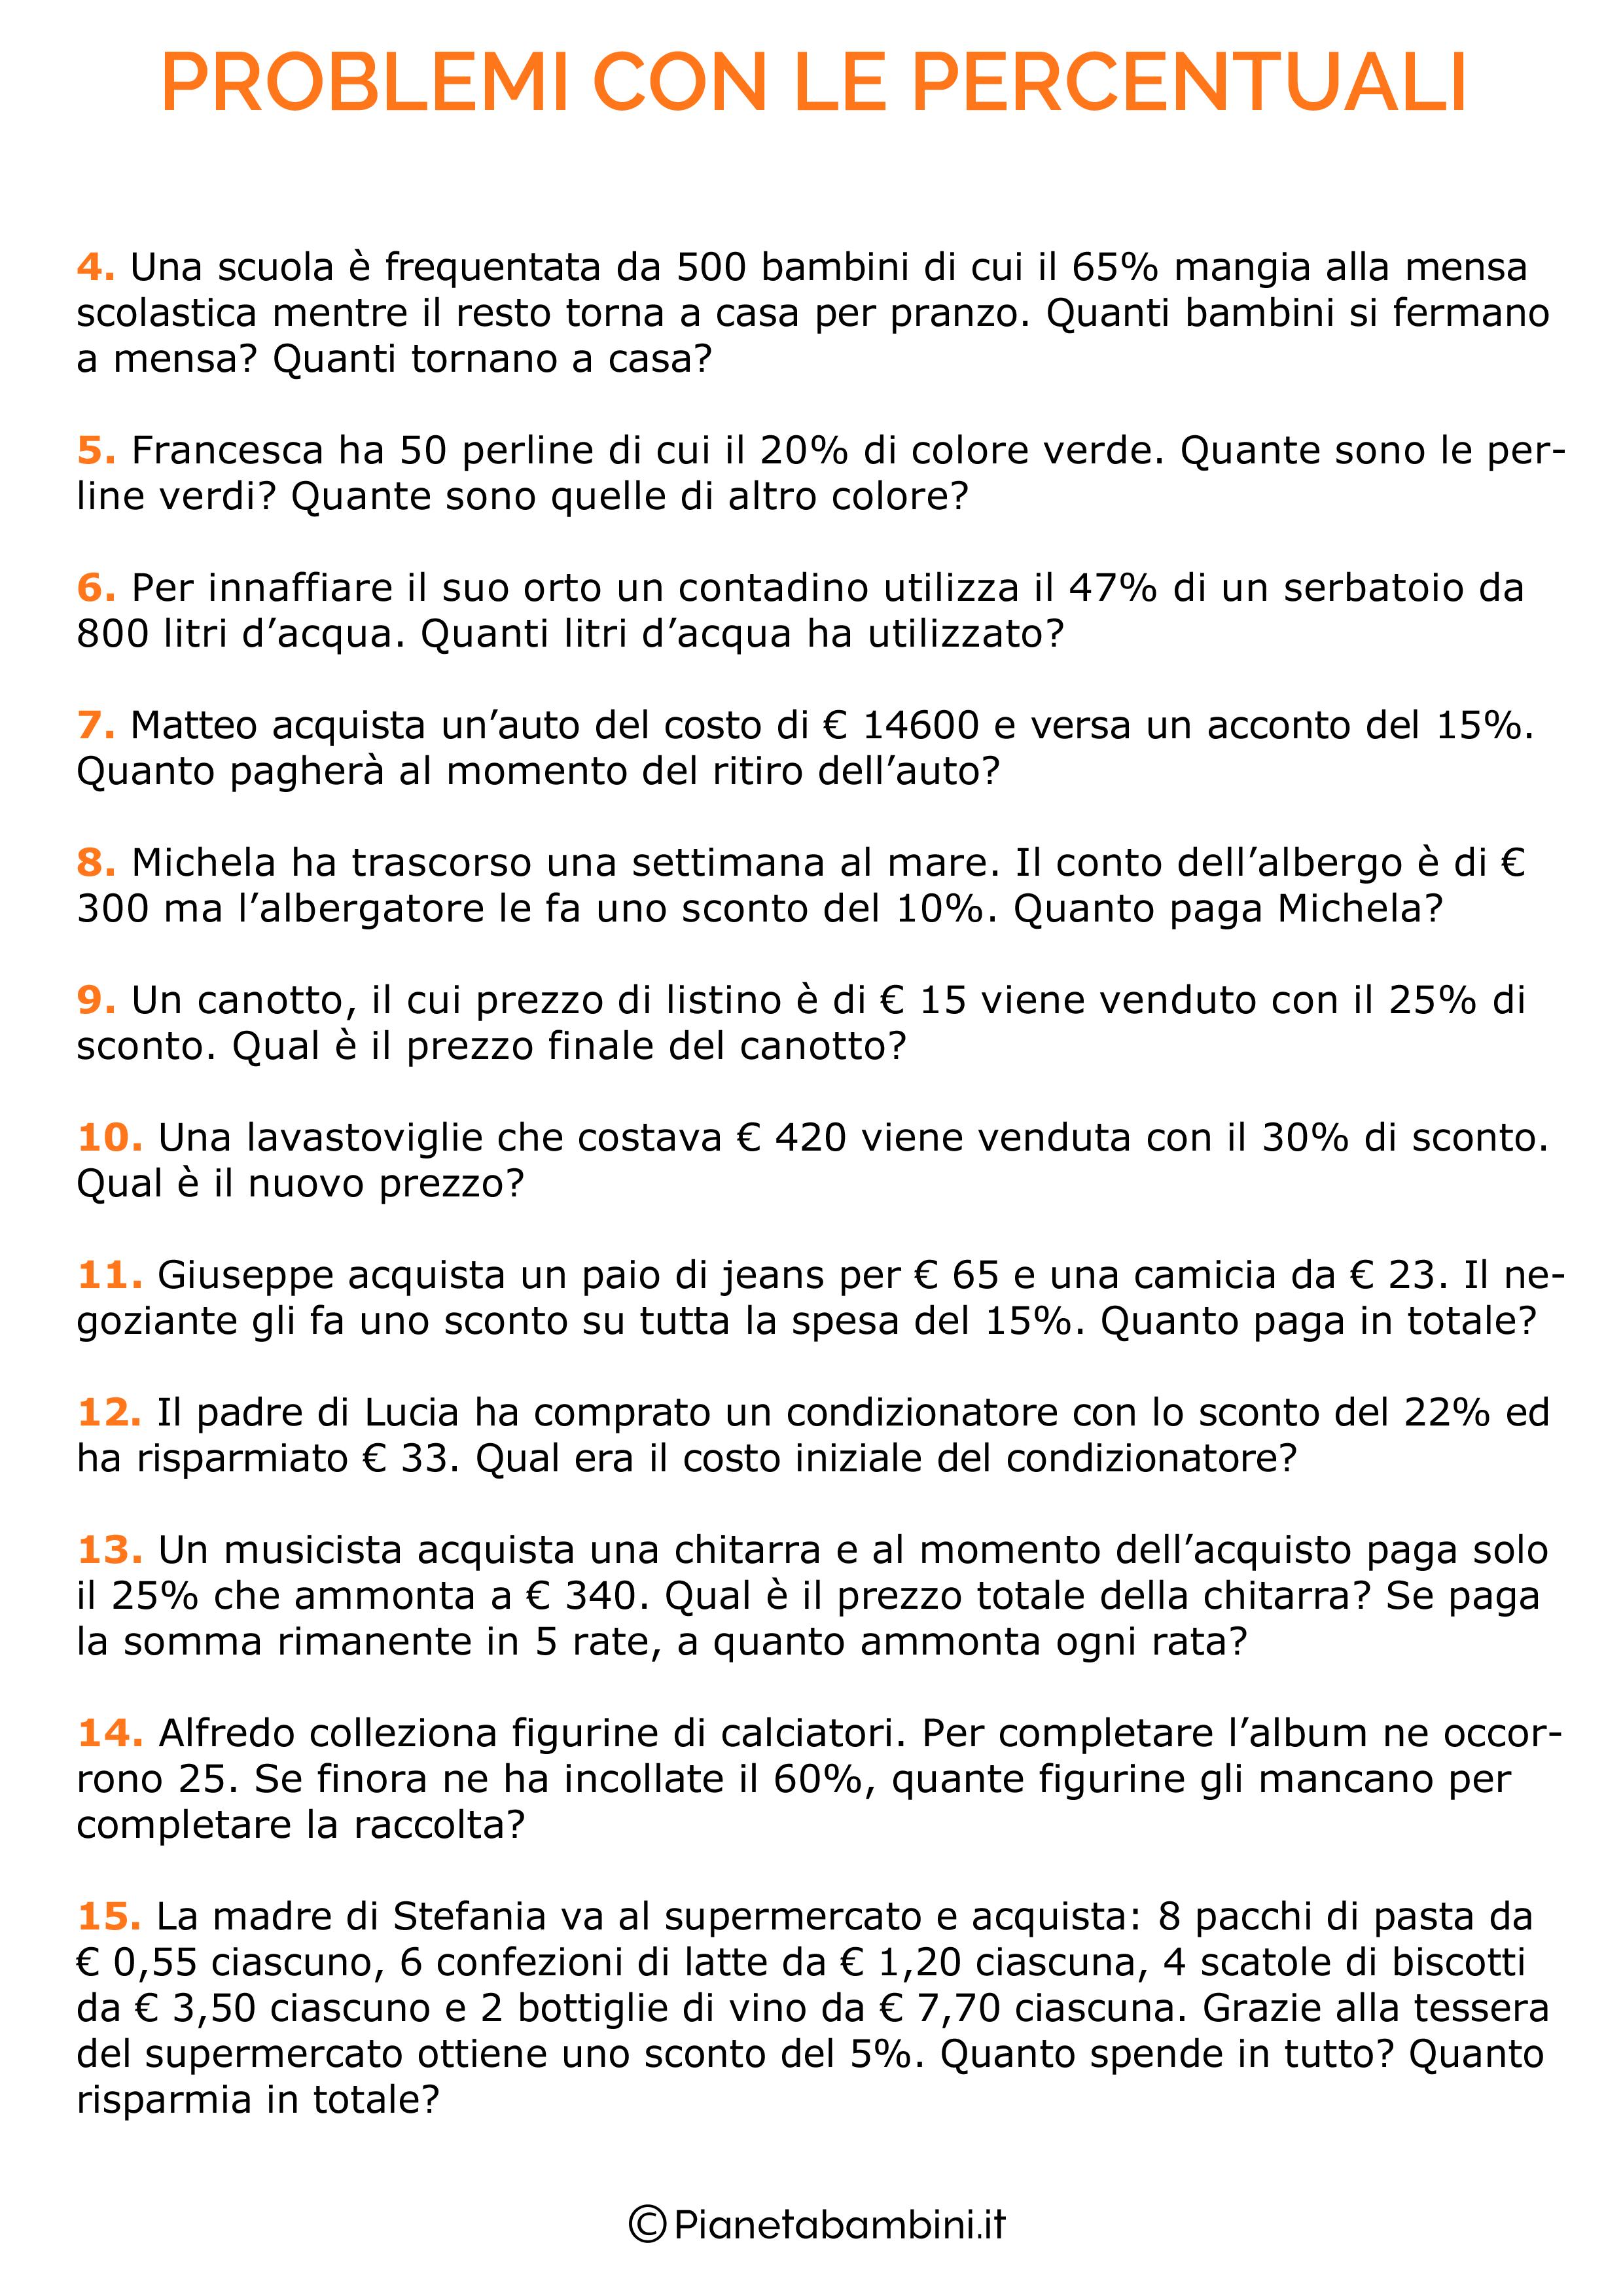 Problemi-Percentuali-2